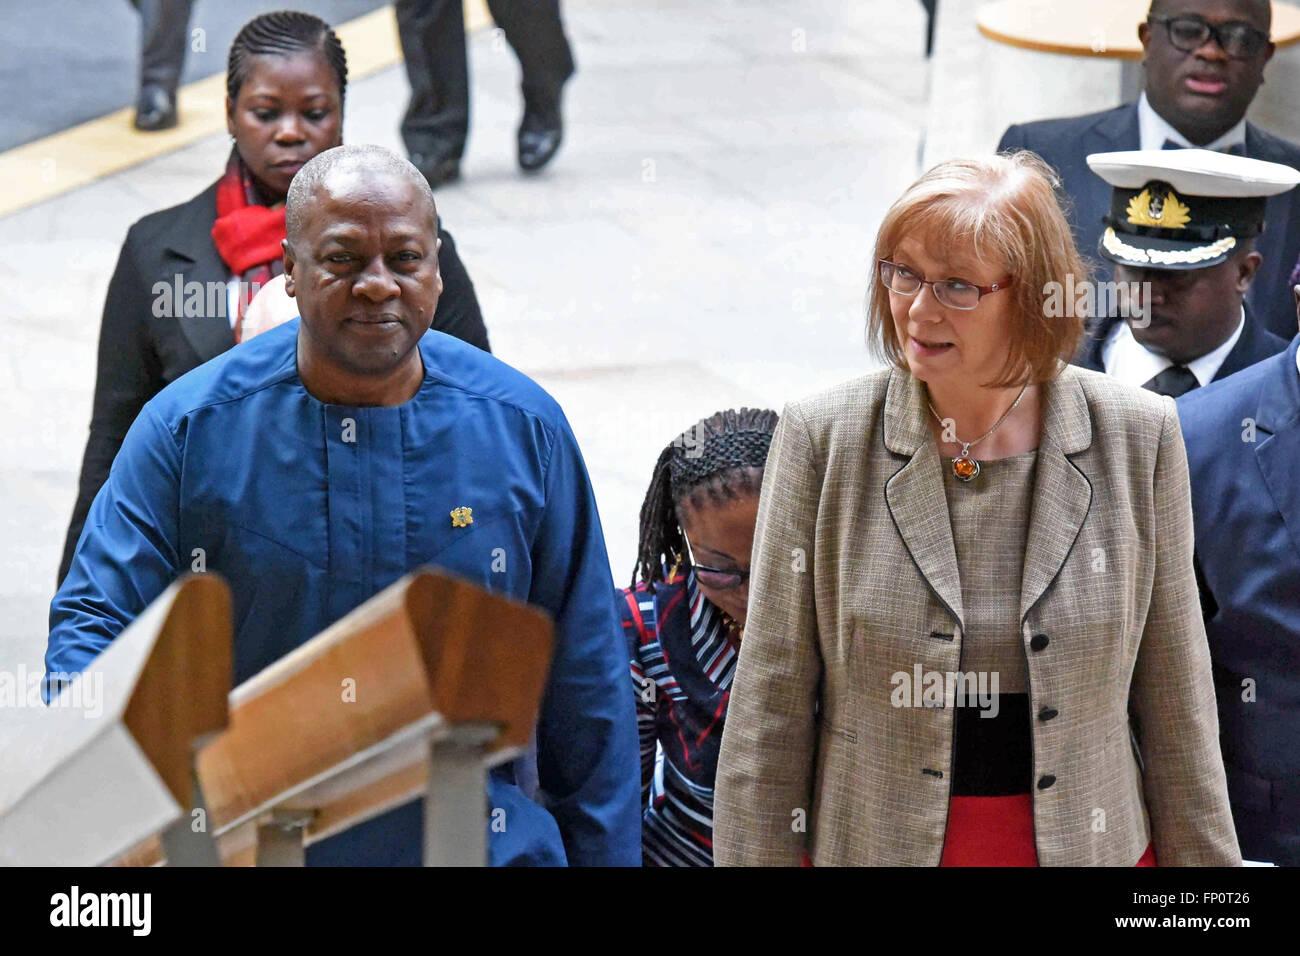 Edinburgh, Scotland, United Kingdom, 17, March, 2016. The President of Ghana, John Dramani Mahama, is accompanied - Stock Image